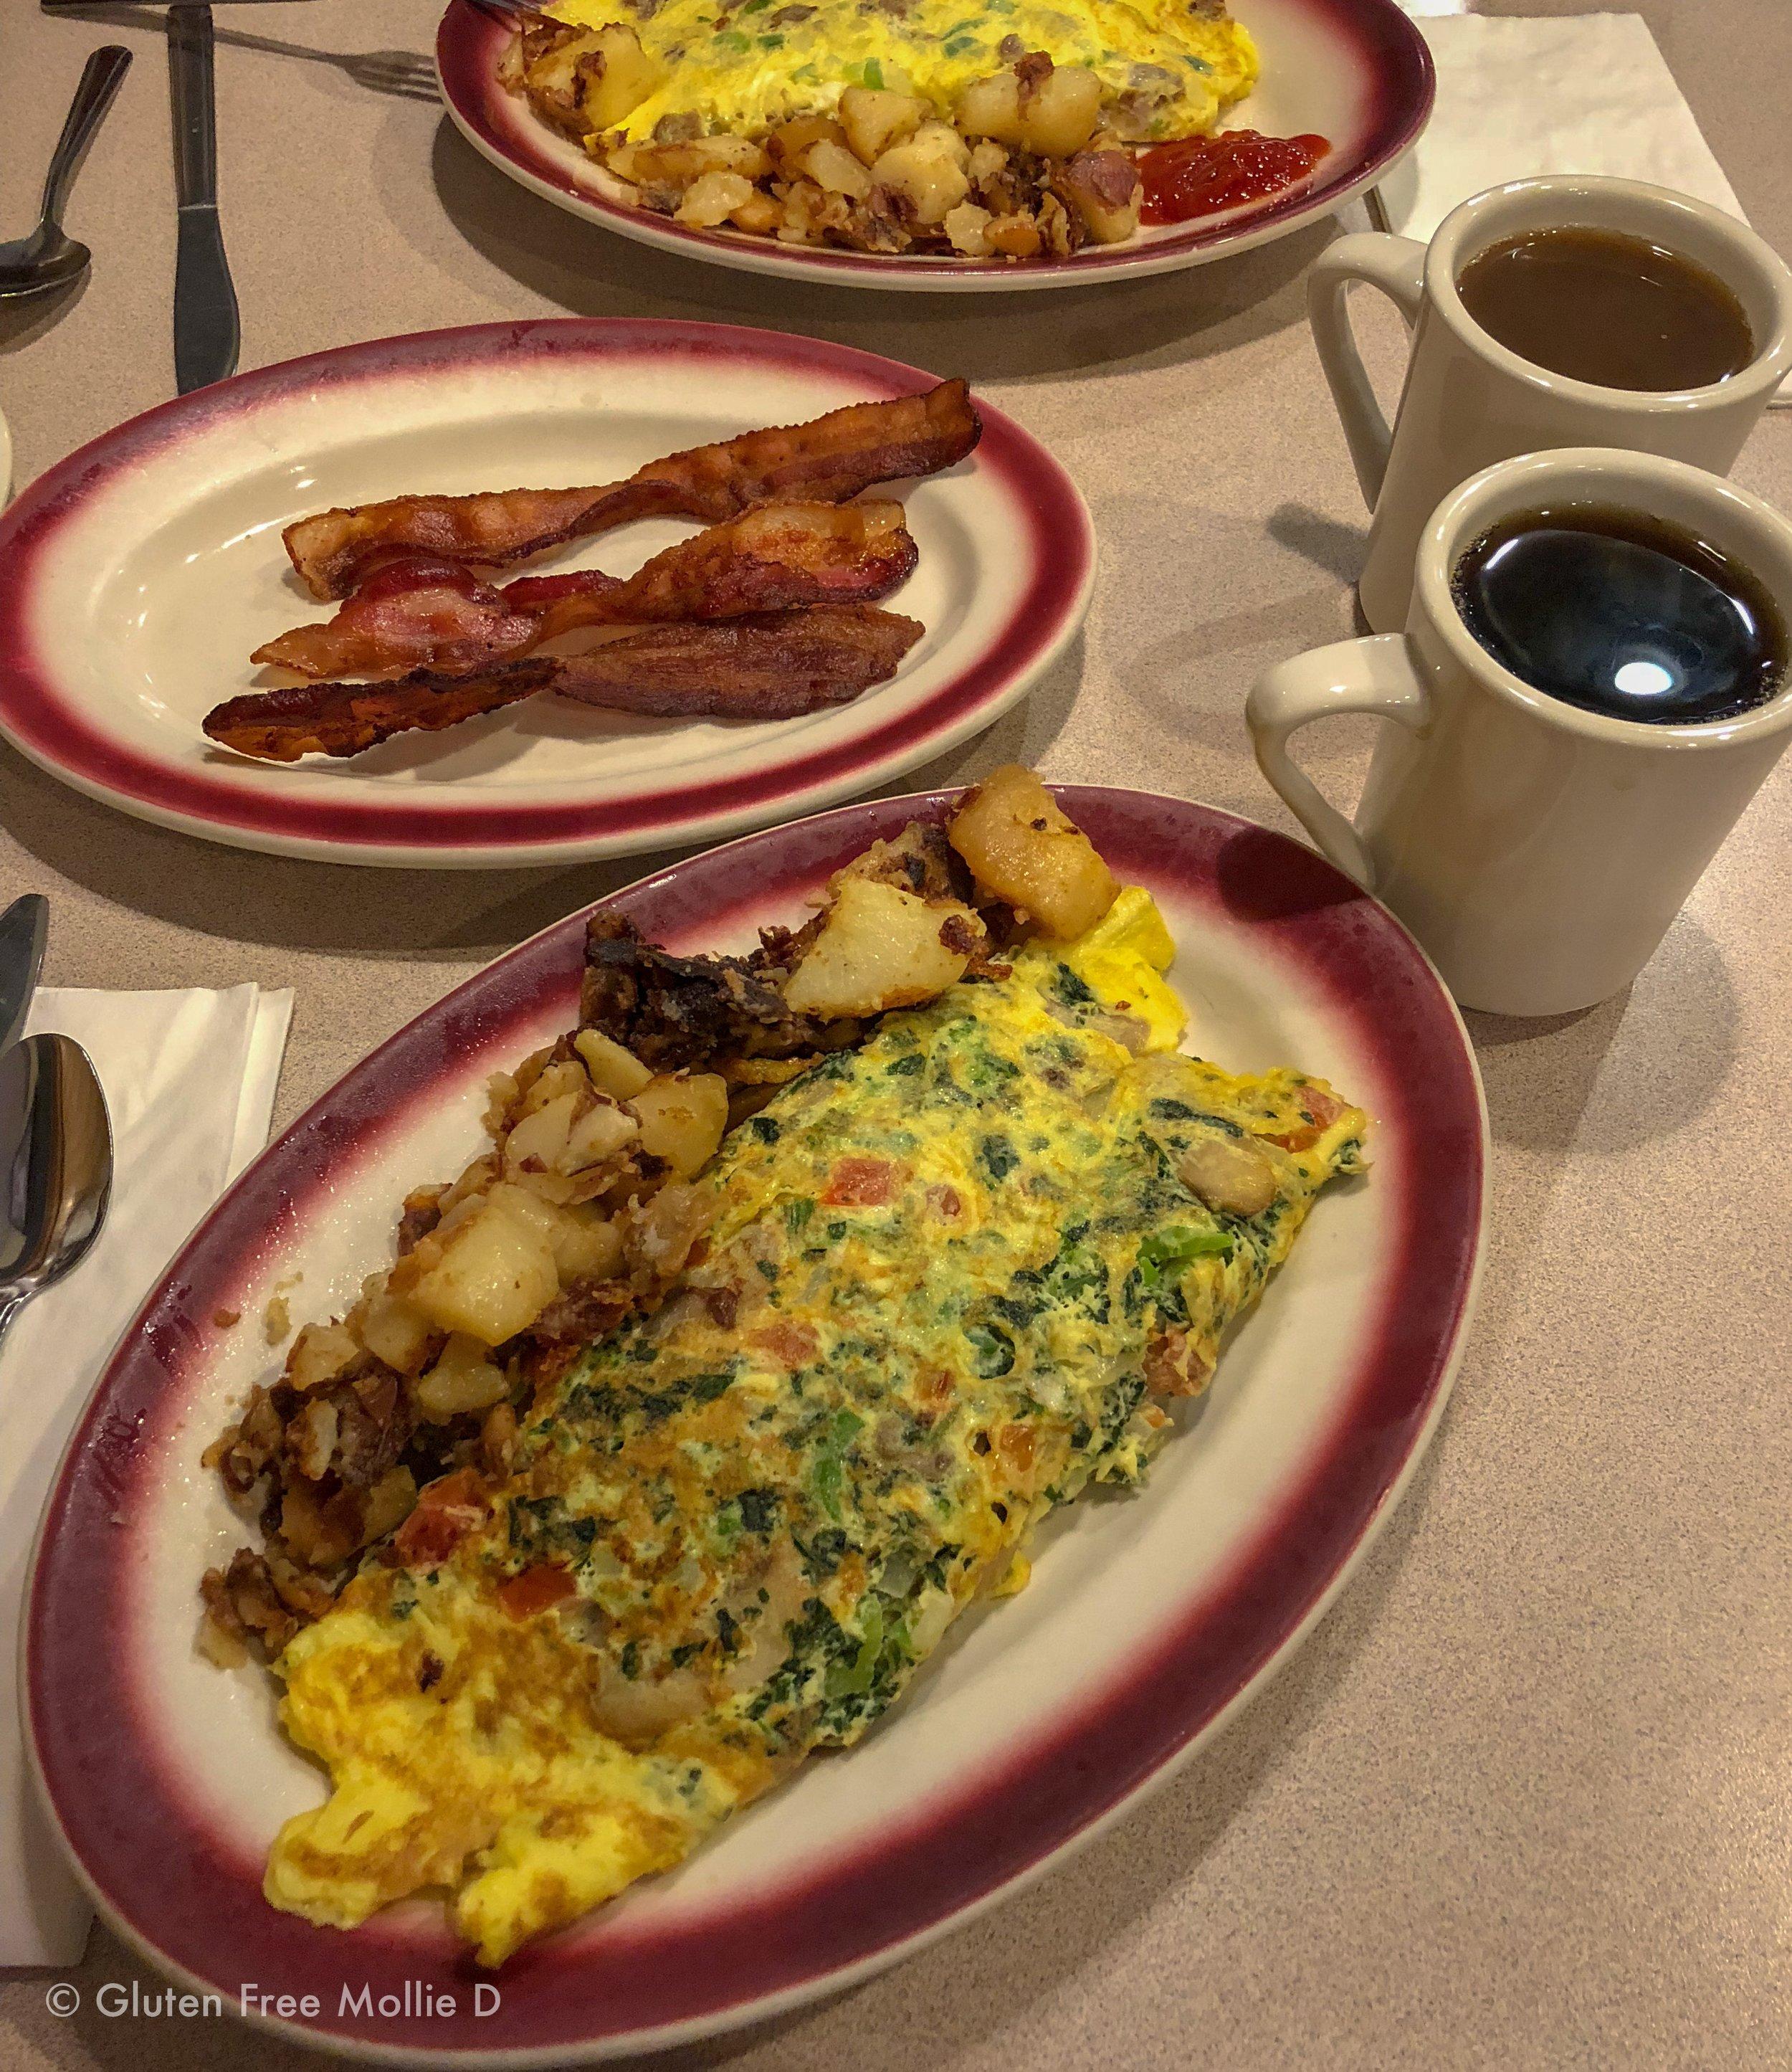 Sunday breakfast, diner-style.